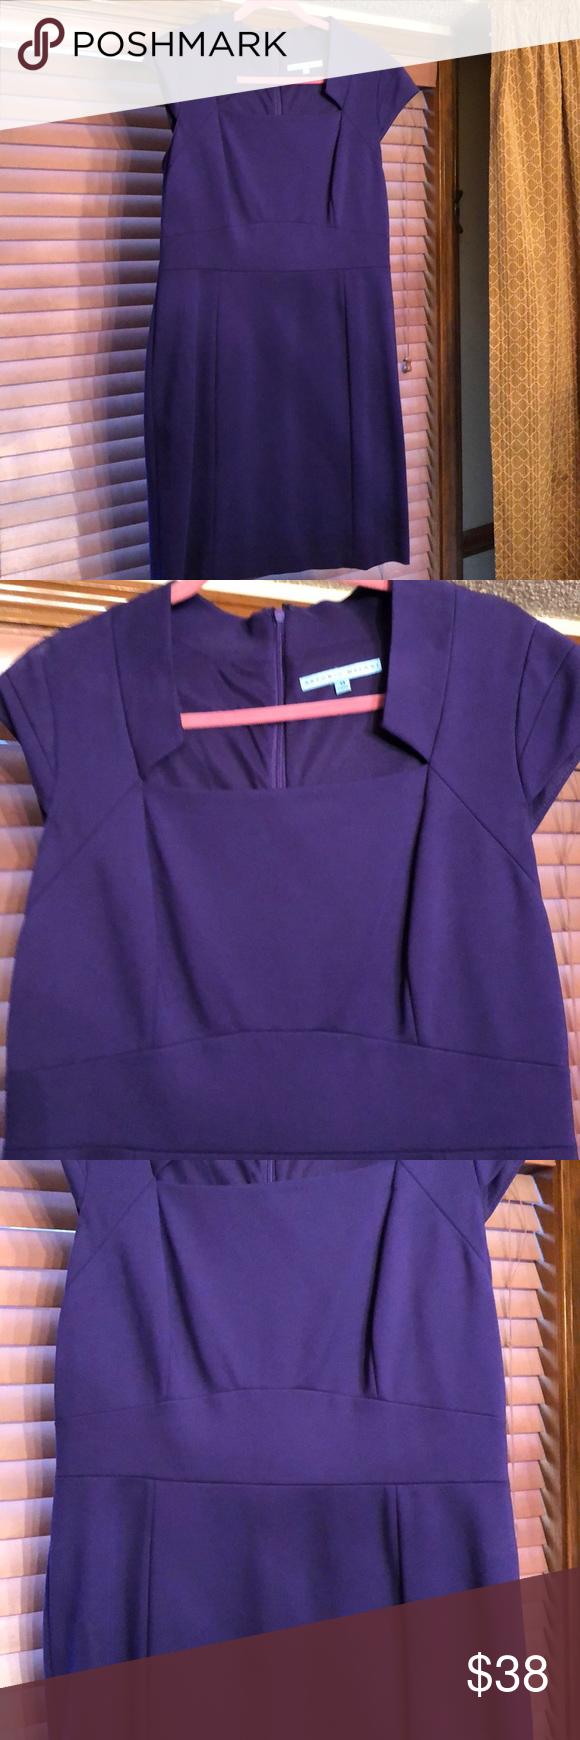 d504919b00c NWT Antonio Melani purple cap Sleeve dress 14 This is a new with tags Antonio  Melani